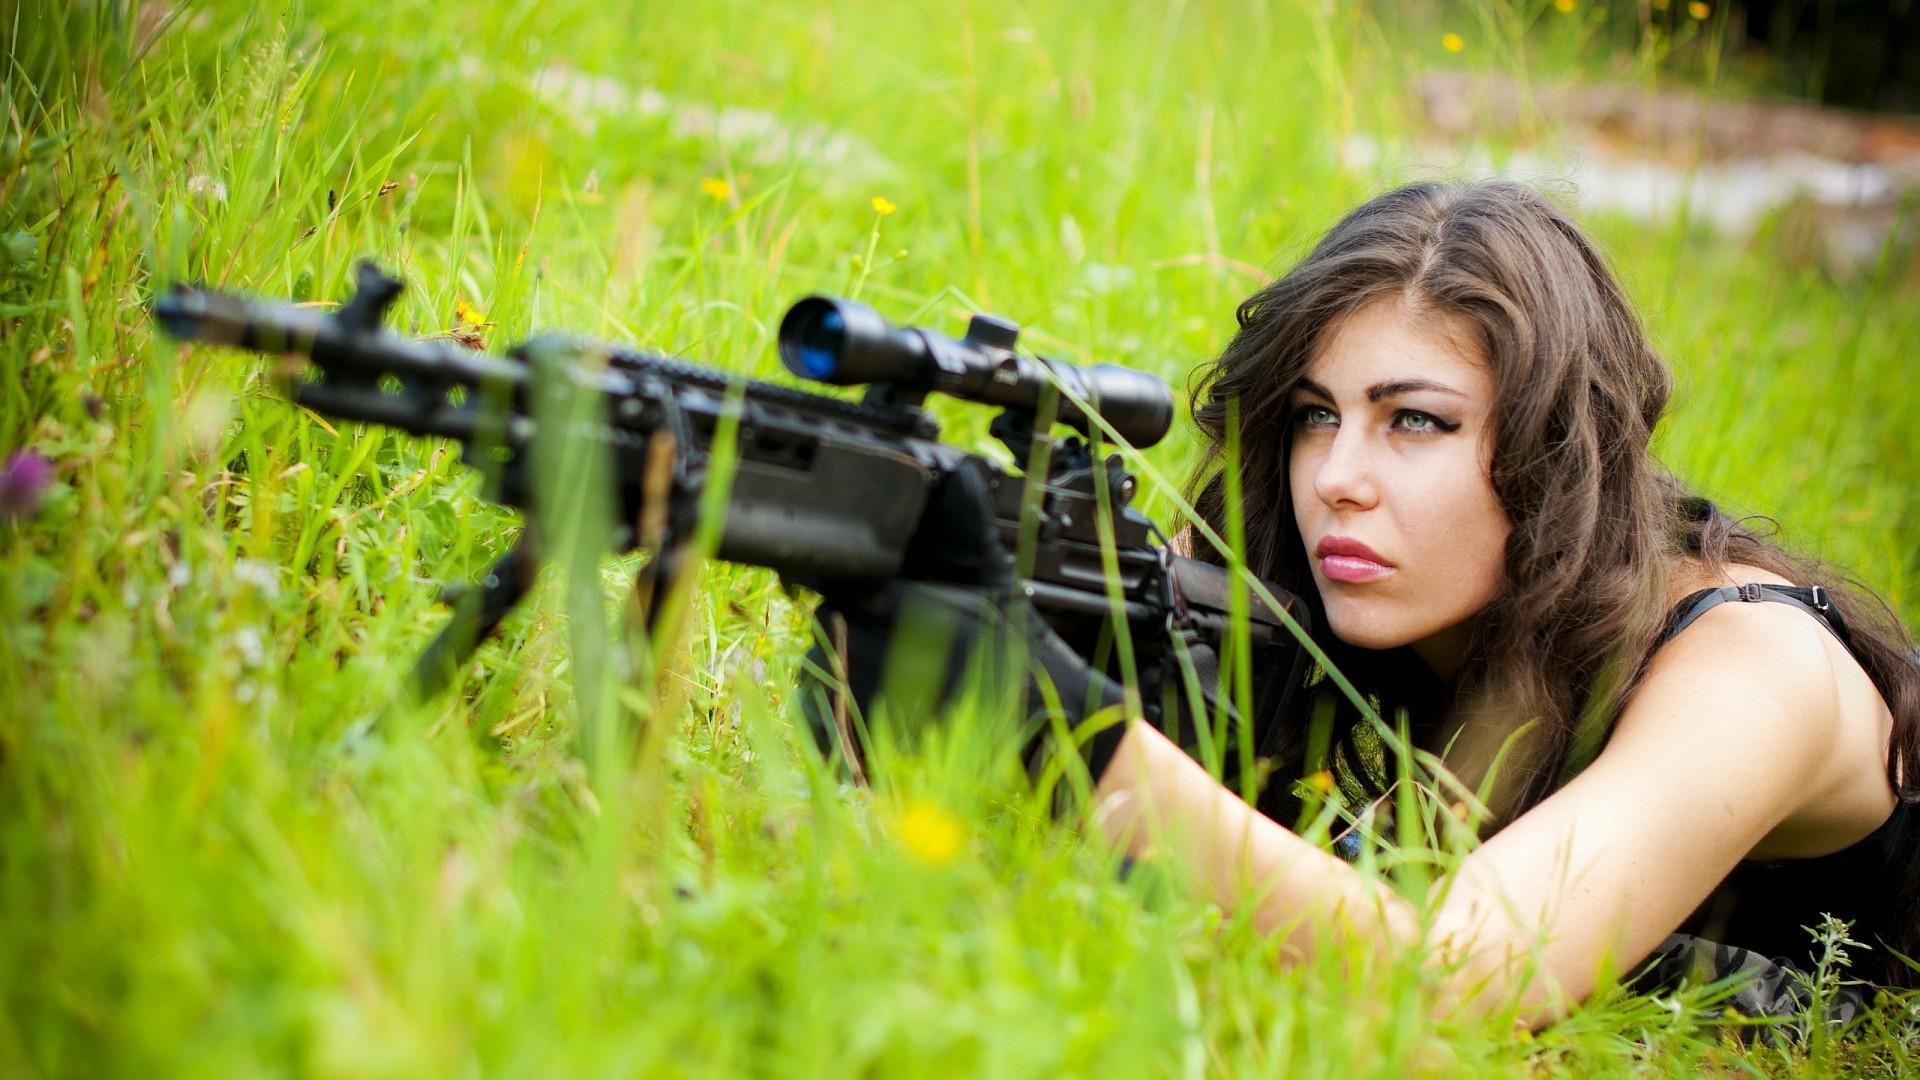 Картинки с девушками снайперами